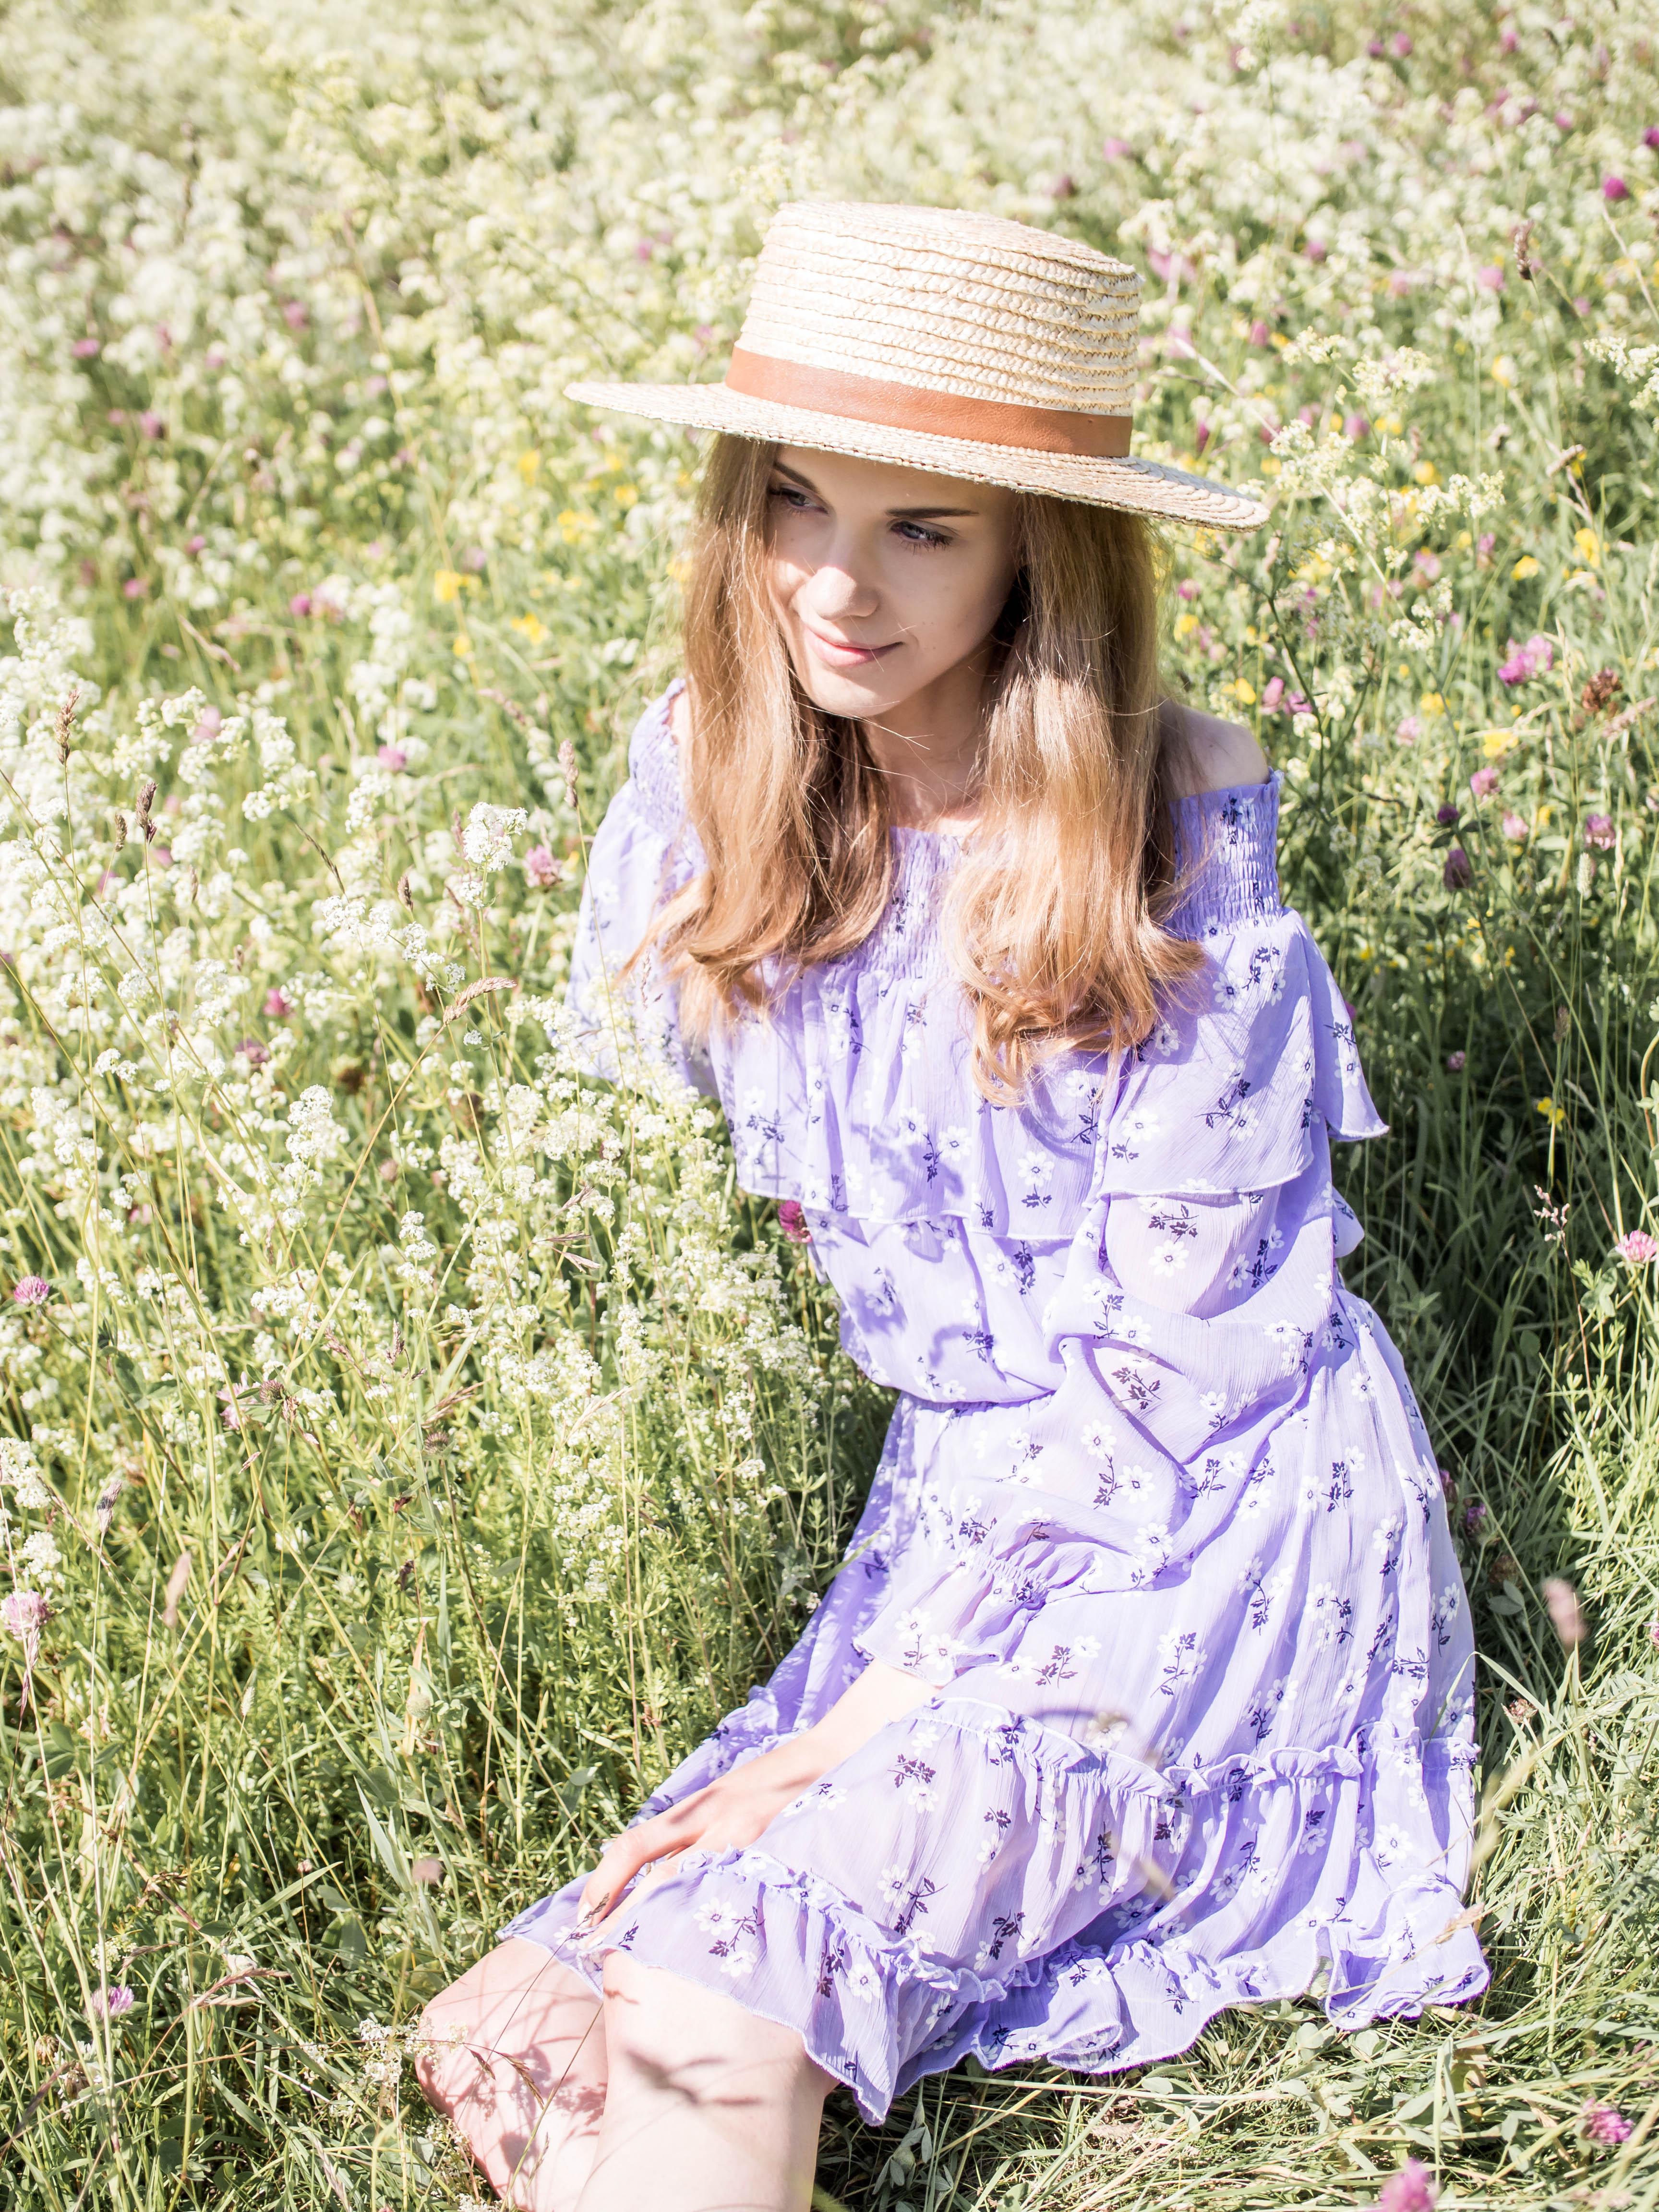 Lavender floral dress - Laventeli kukkamekko